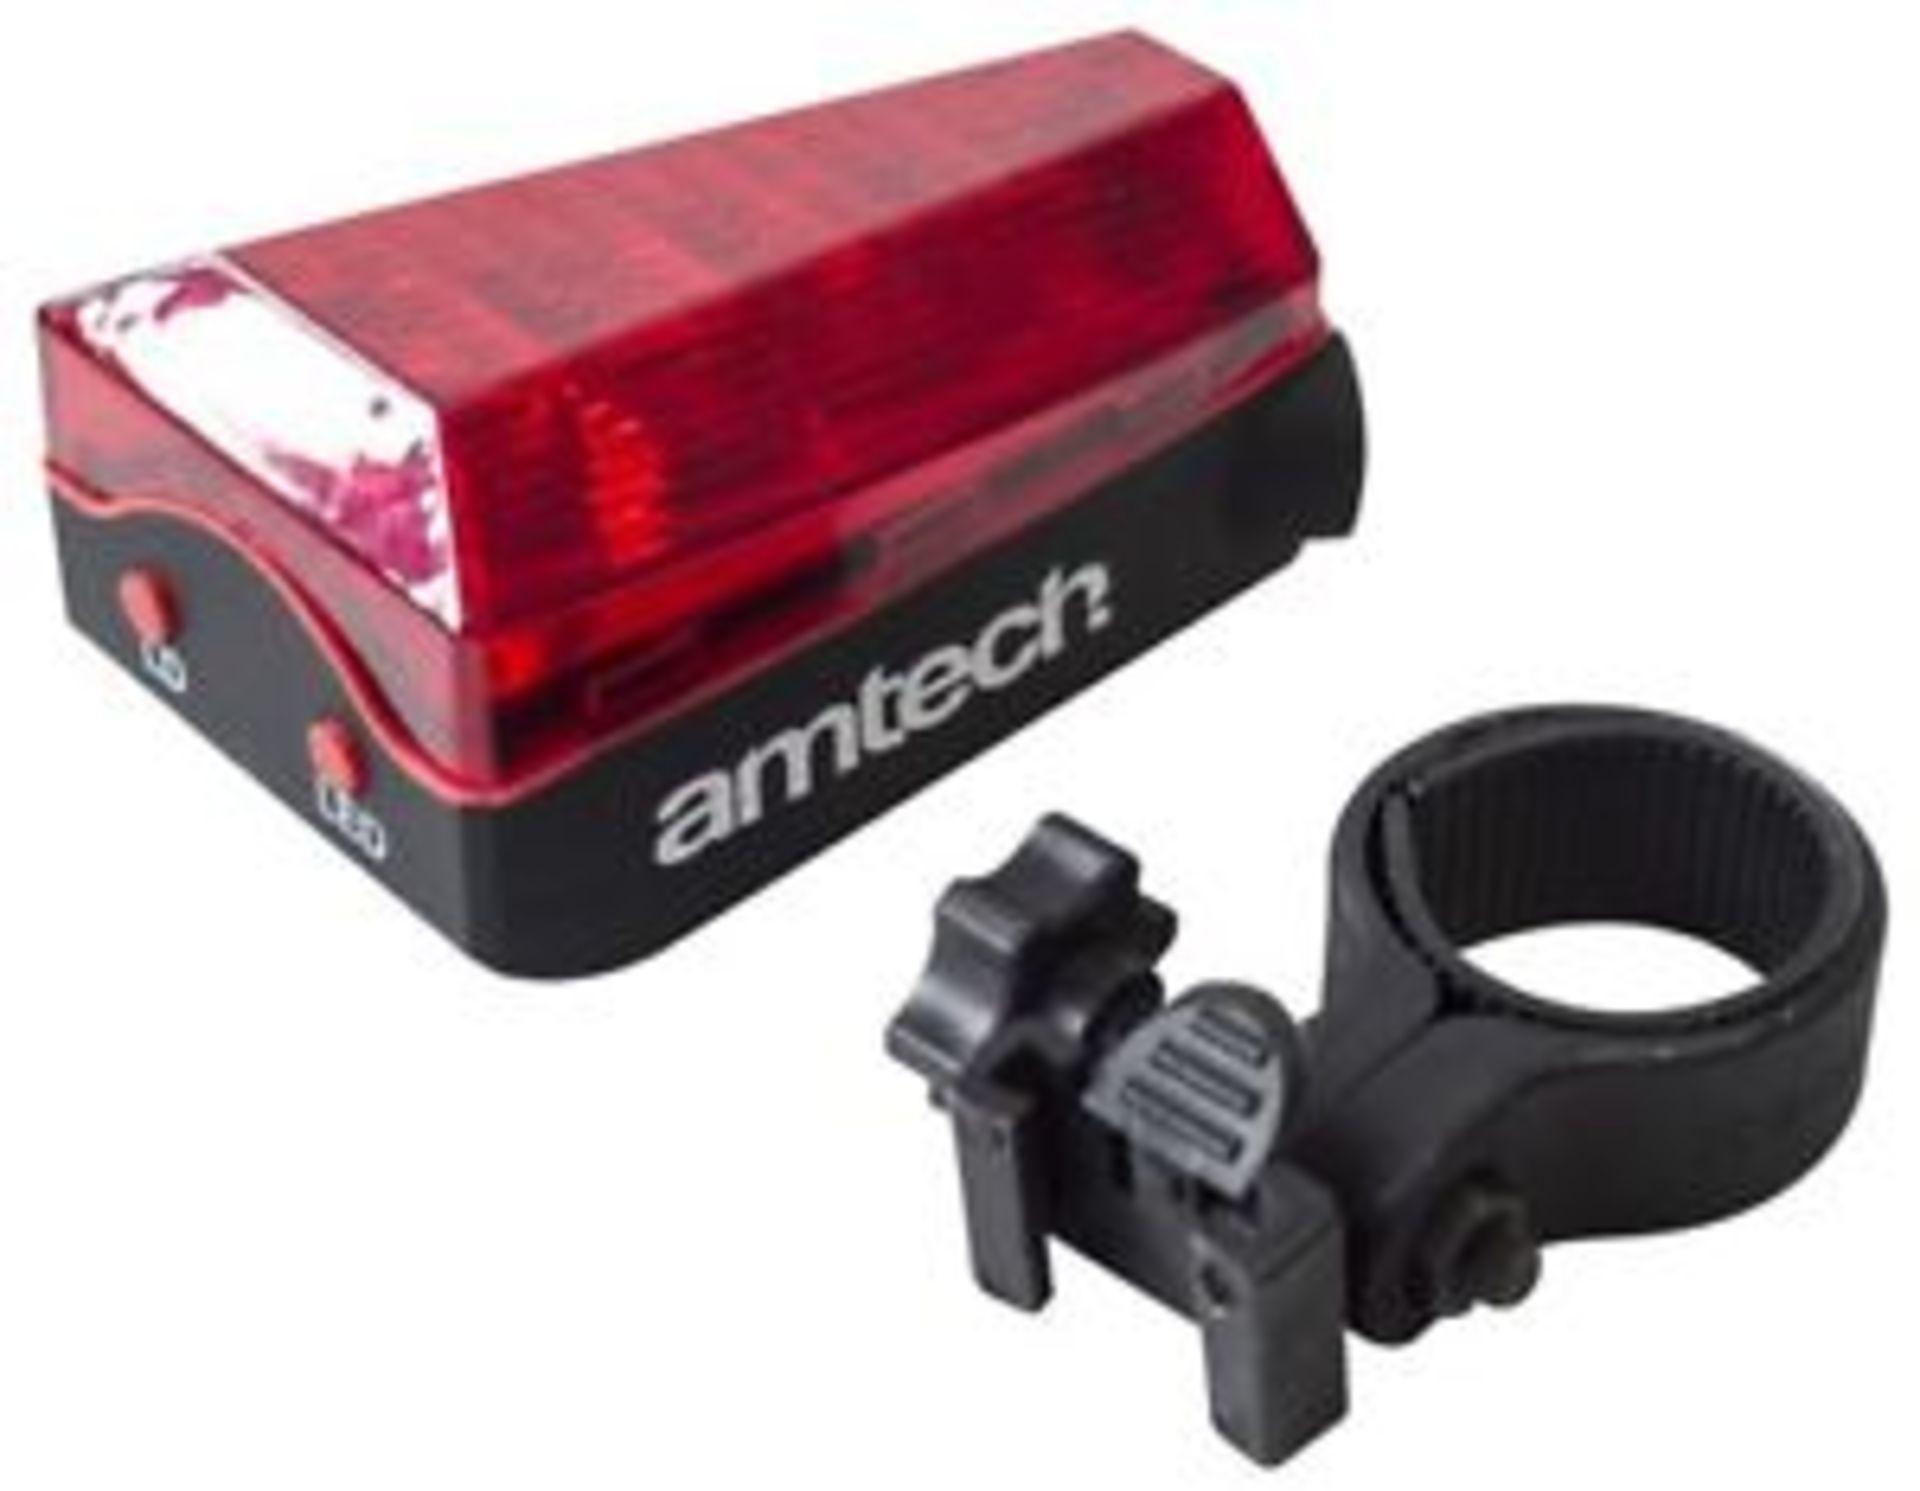 Lot 12451 - V Brand New Laser Tail LED Bike Light Includes 2xAA Batteries